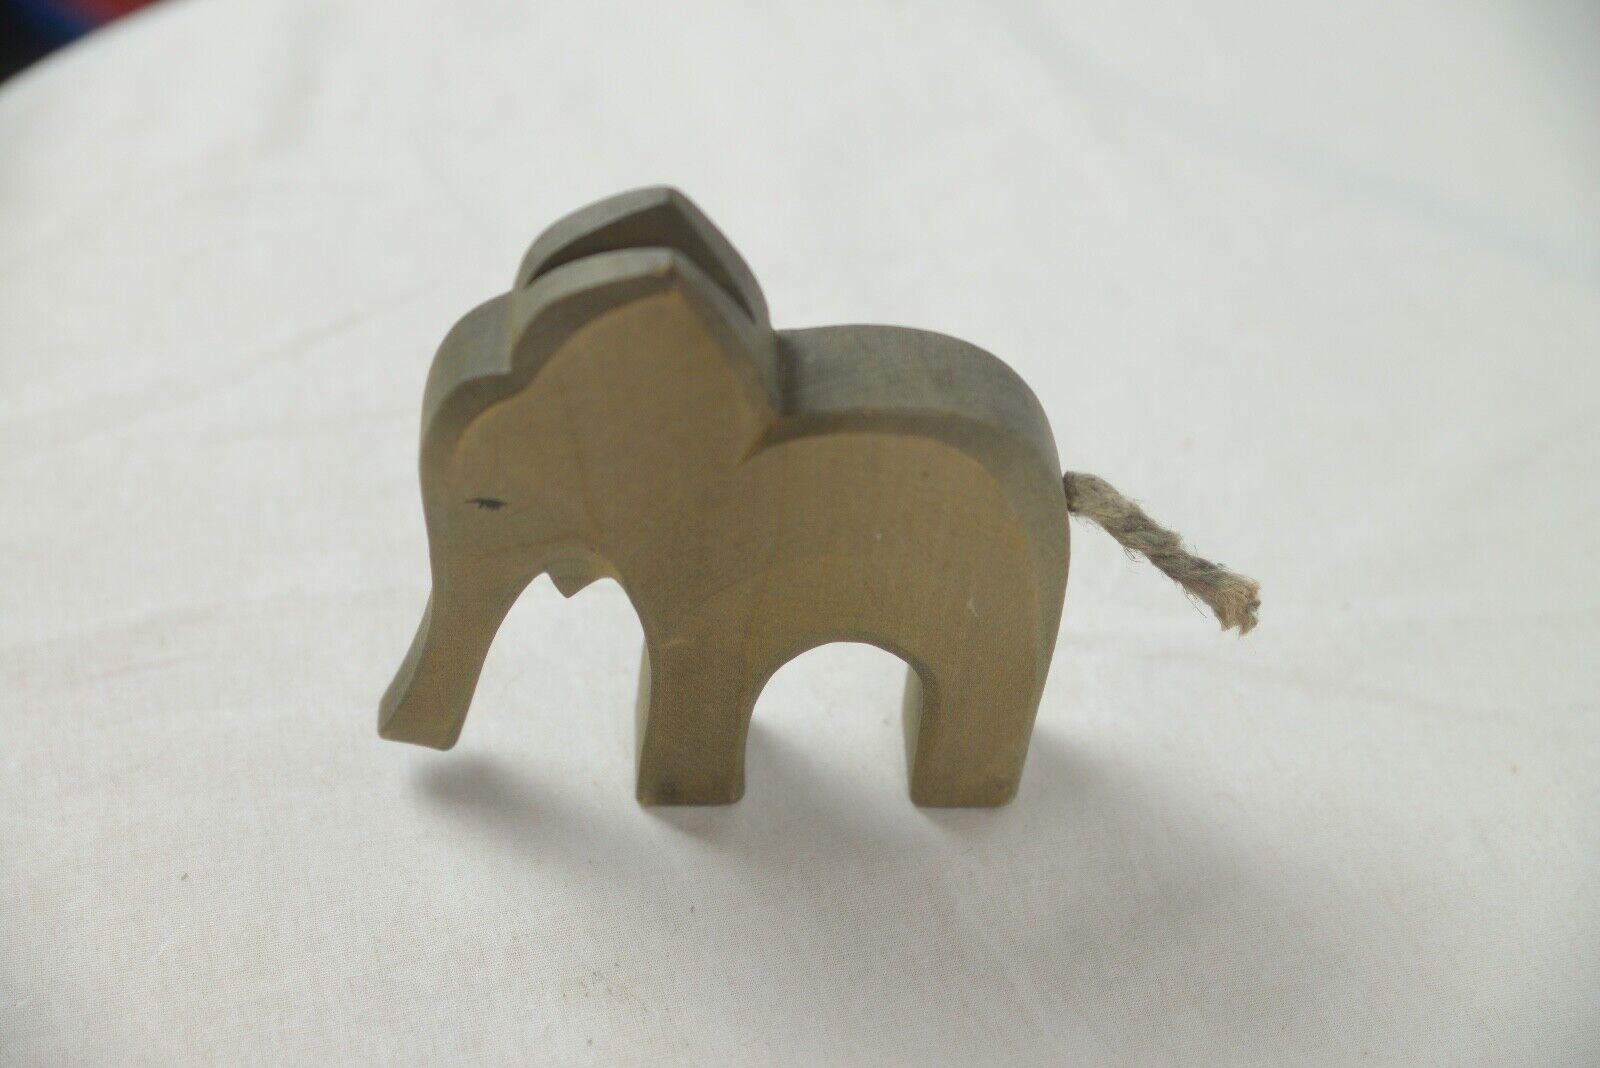 NEU NEU NEU & UNBESPIELT Ostheimer RARITÄT nicht mehr erhältlich Elefant groß Waldorf 5d0f90